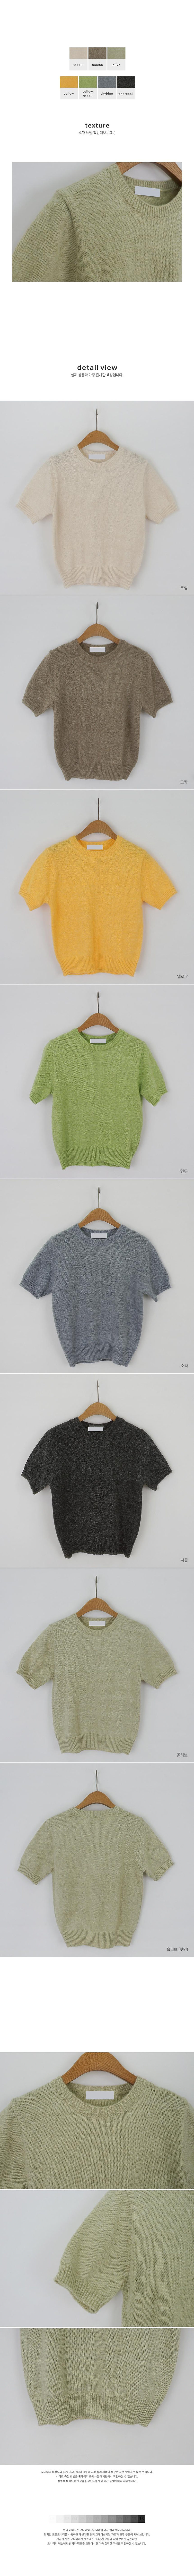 Rupmi Knitwear Short Sleeve